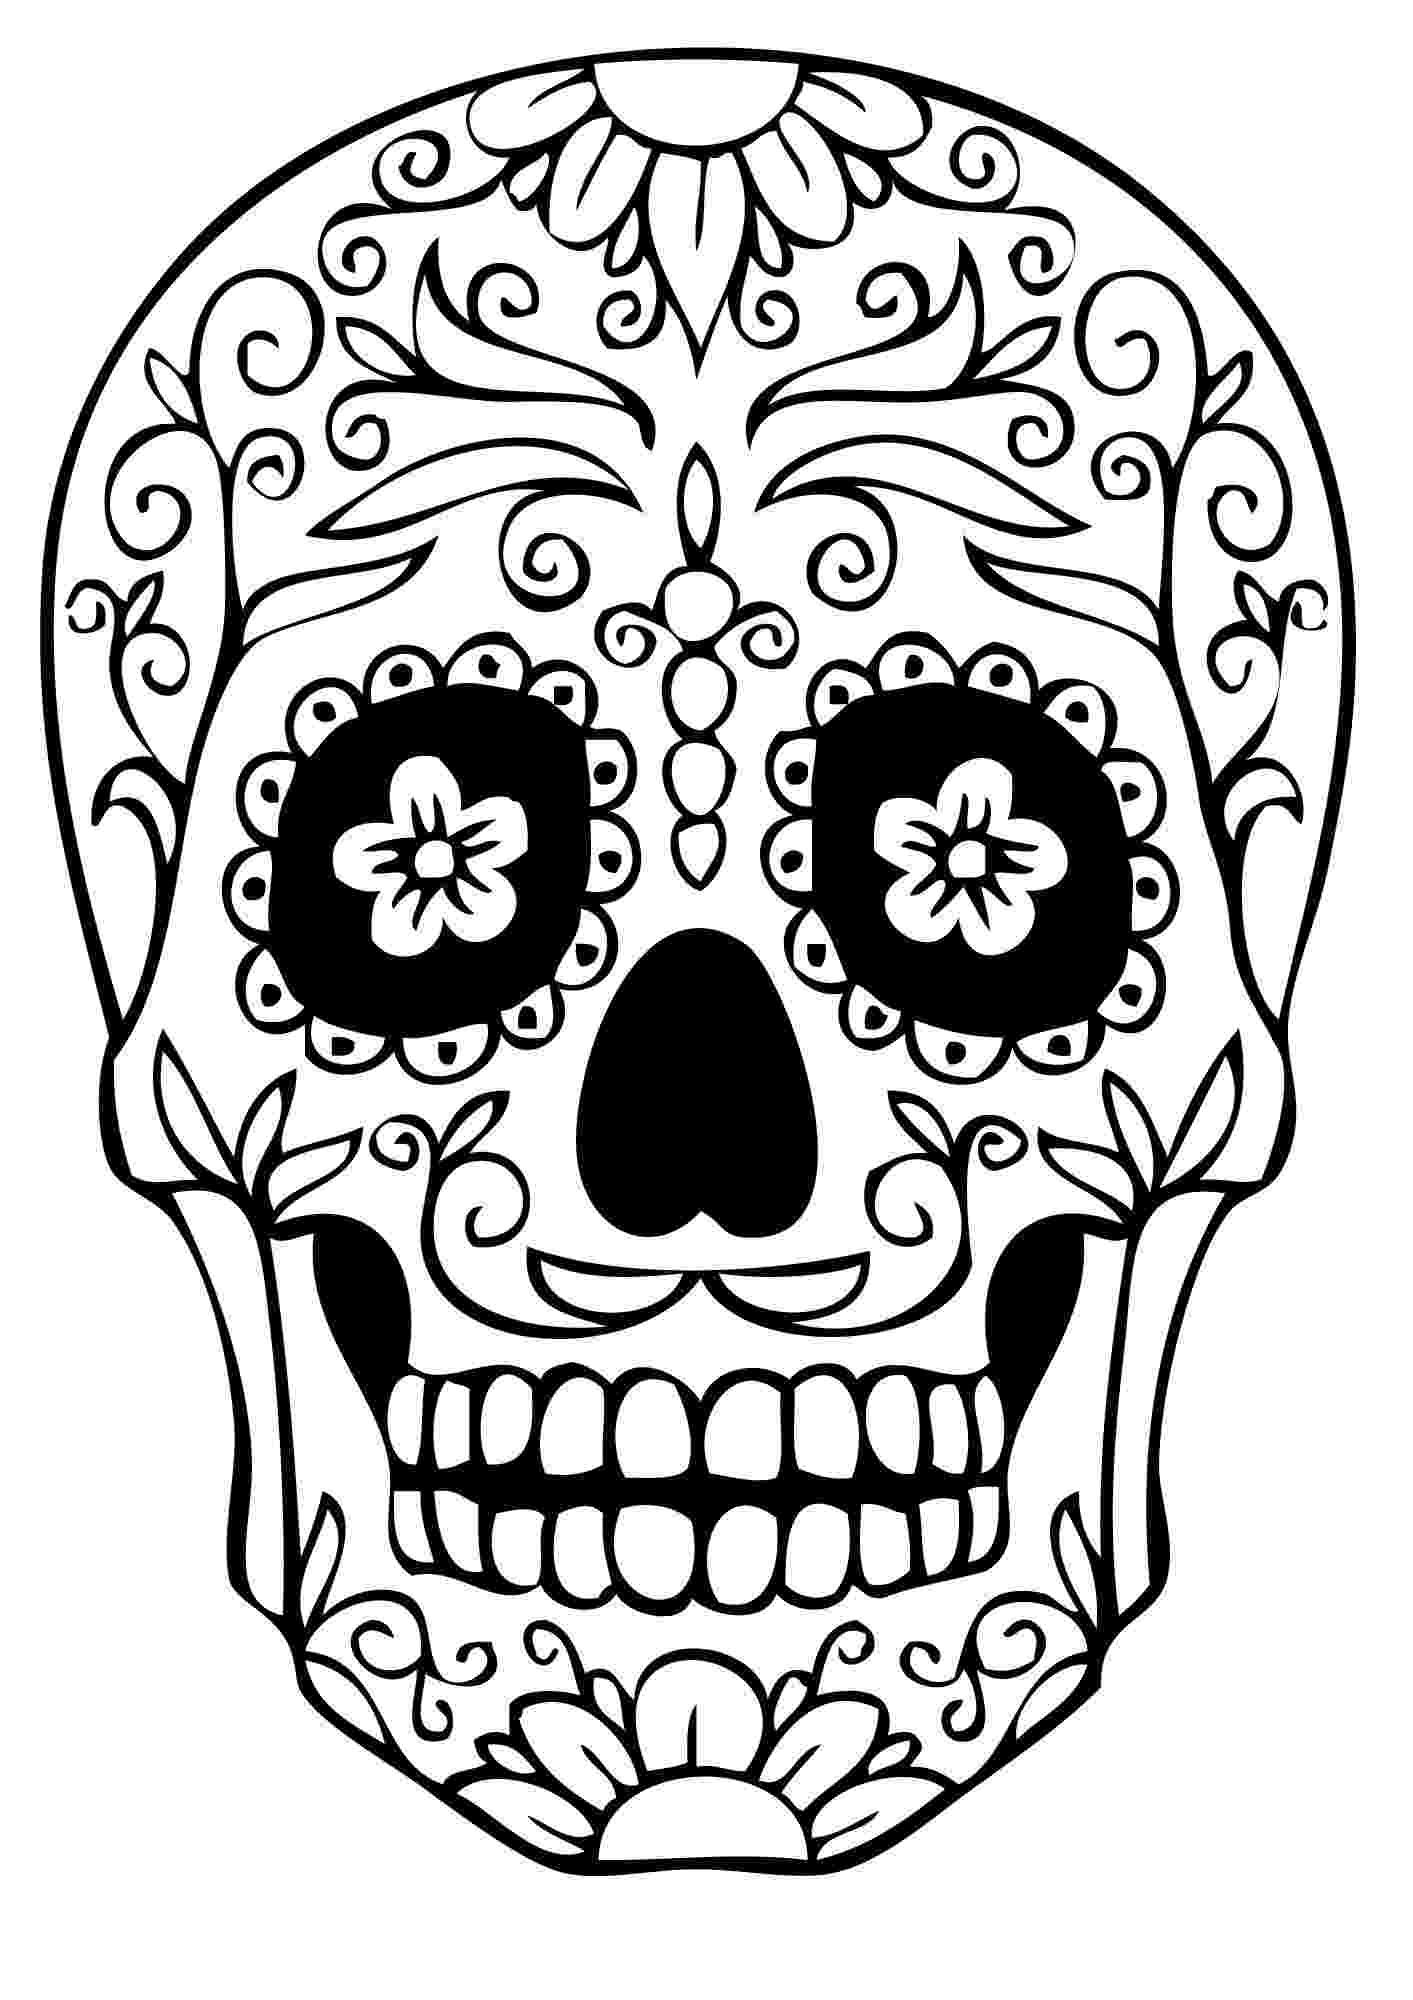 sugar skulls pictures sugar skull coloring pages best coloring pages for kids pictures skulls sugar